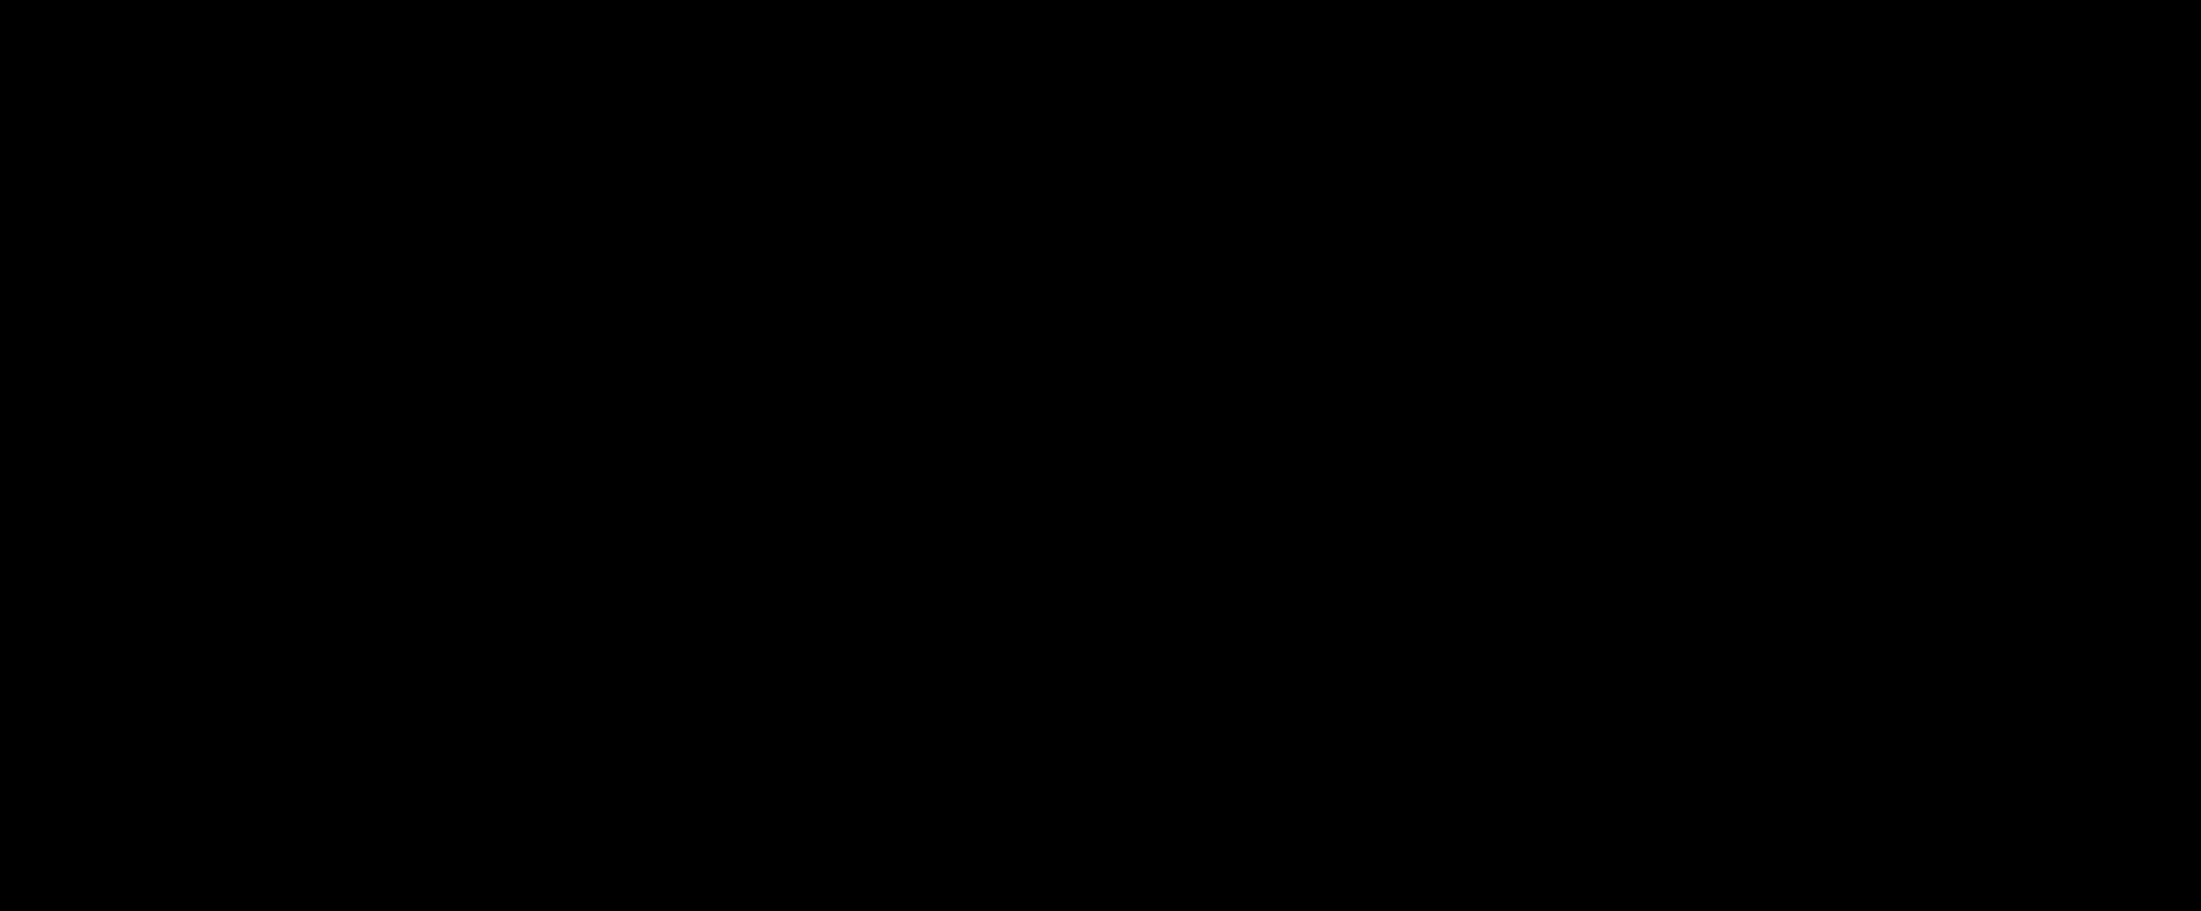 pta-logo-clipart-1.jpg